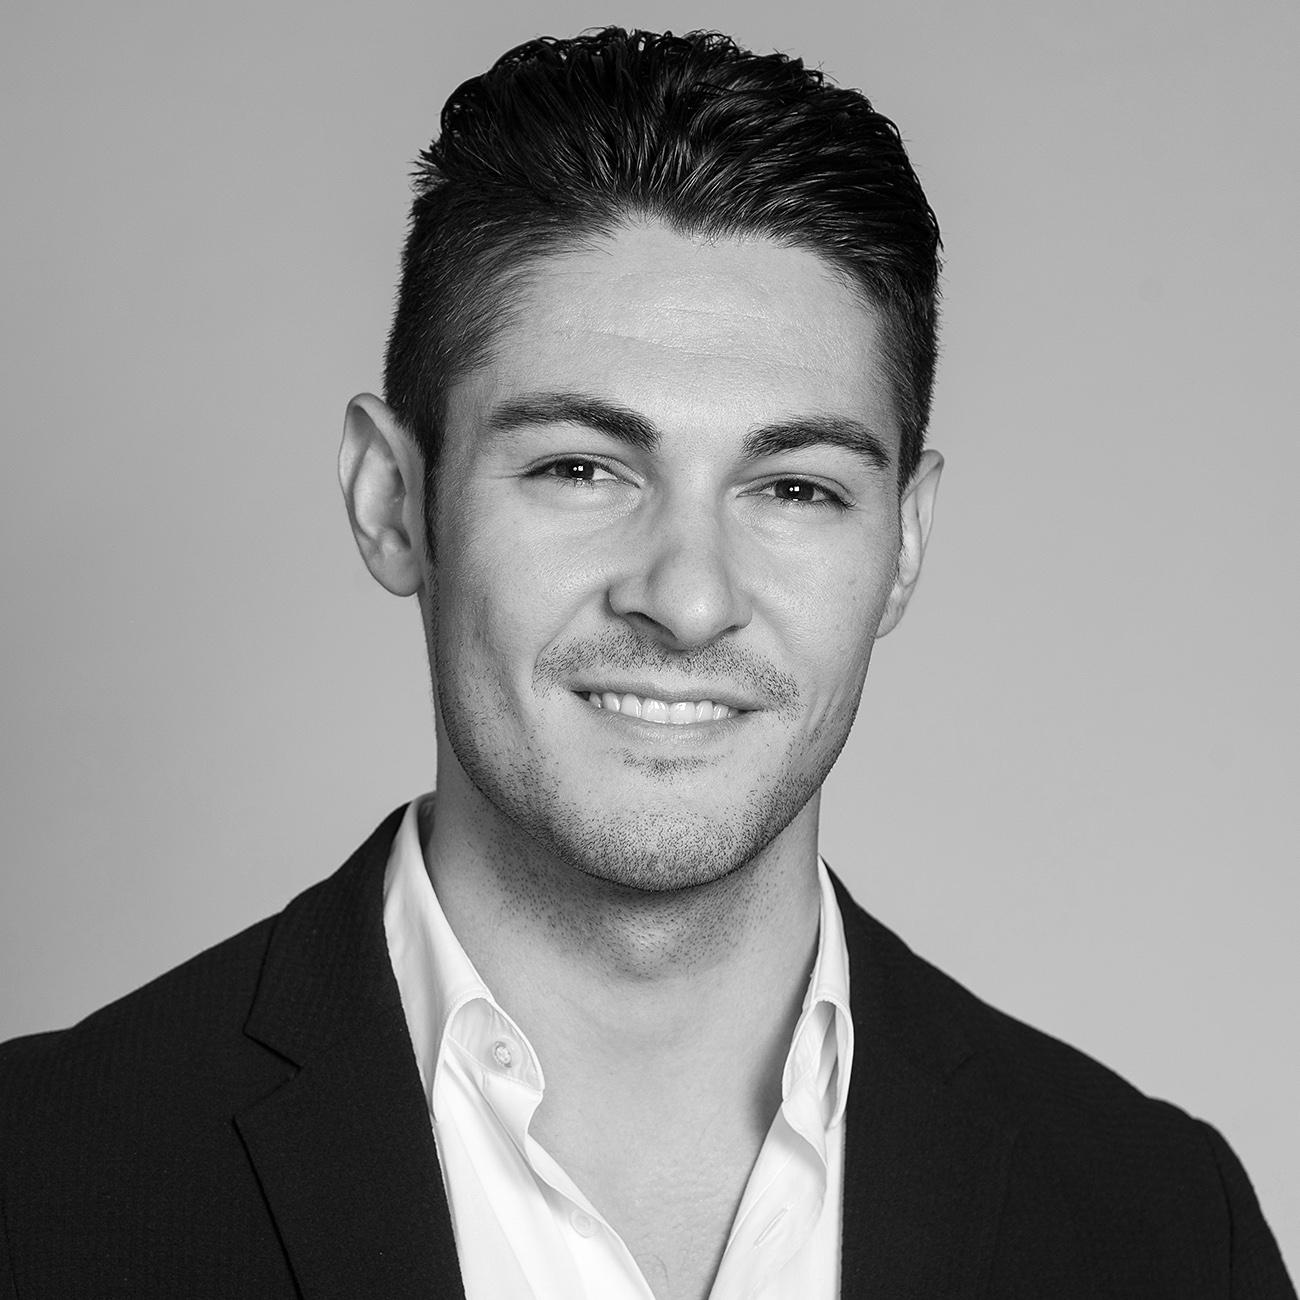 DwayneBrownStudio_Jonathan_LinkedIn_Profiles.jpg